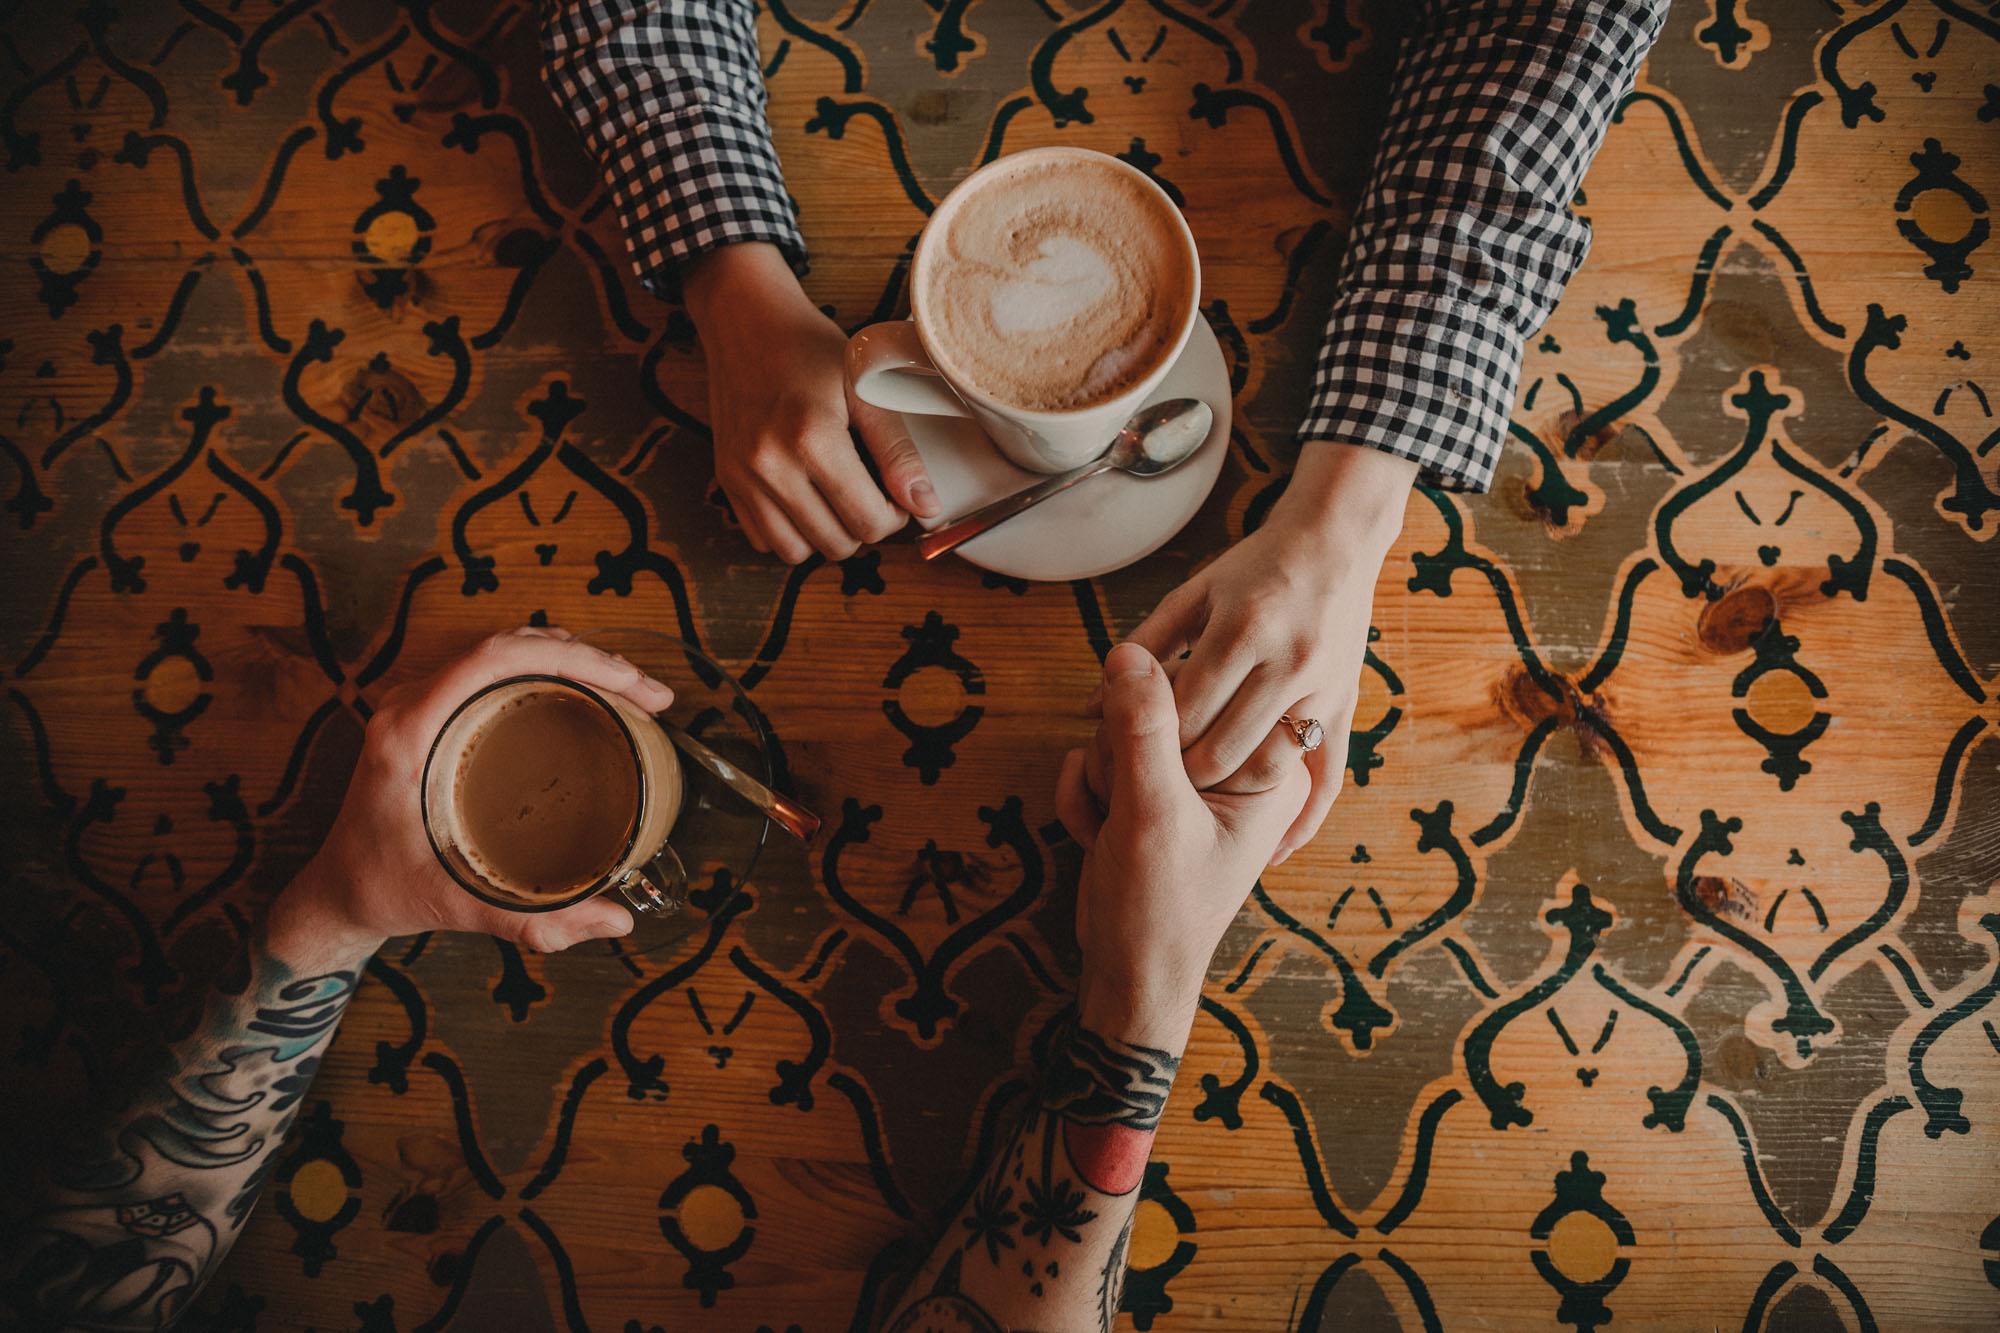 Cafe-Bar-Engagement-Photography1.jpg